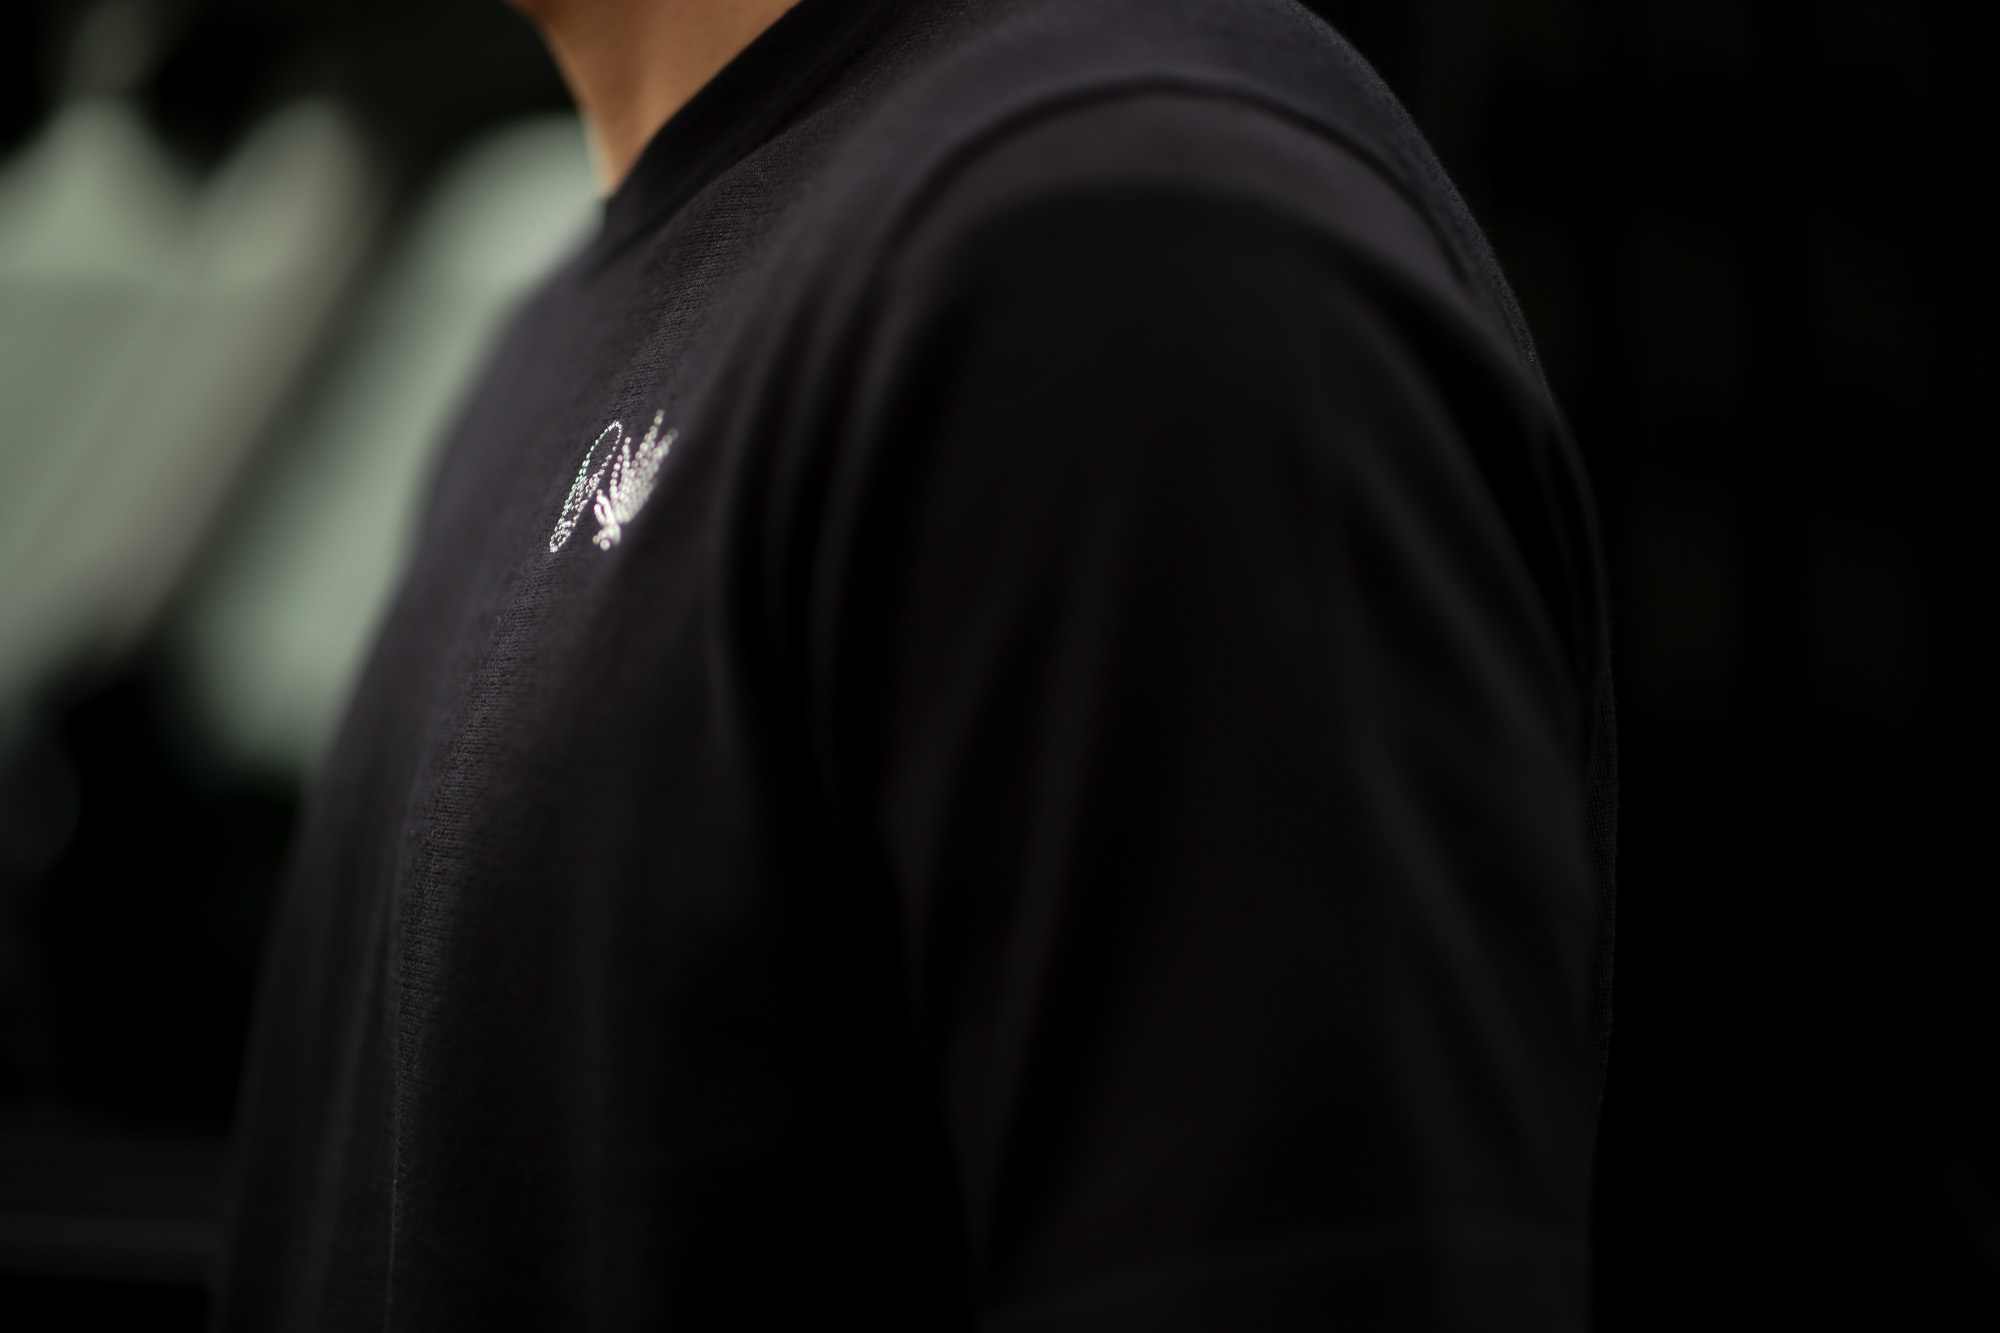 lucien pellat-finet (ルシアン ペラフィネ) SKULL & LEAF ON CHEST ROUND NECK SHORT SLEEVE PULLOVER スカル & リーフ コットン ニット Tシャツ BLACK (ブラック) 2019 春夏新作 lucienpellatfinet 愛知 名古屋 altoediritto アルトエデリット